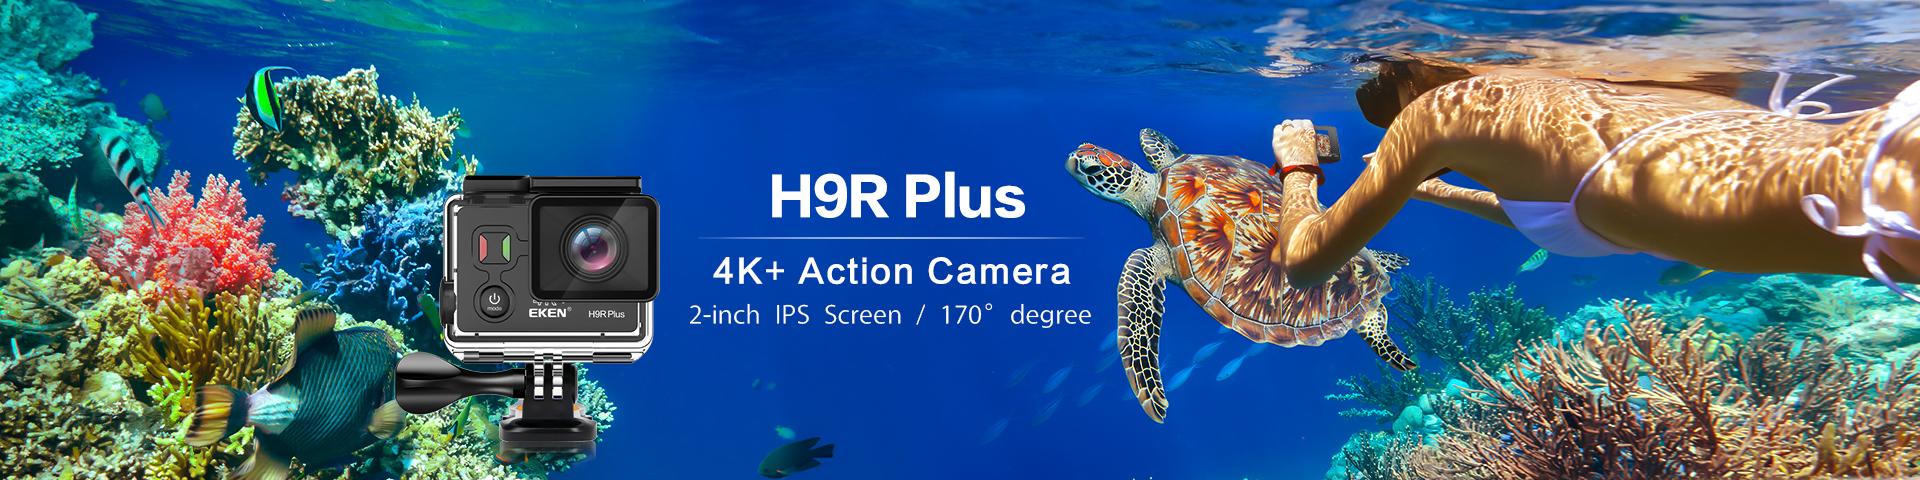 H9R Plus action camera